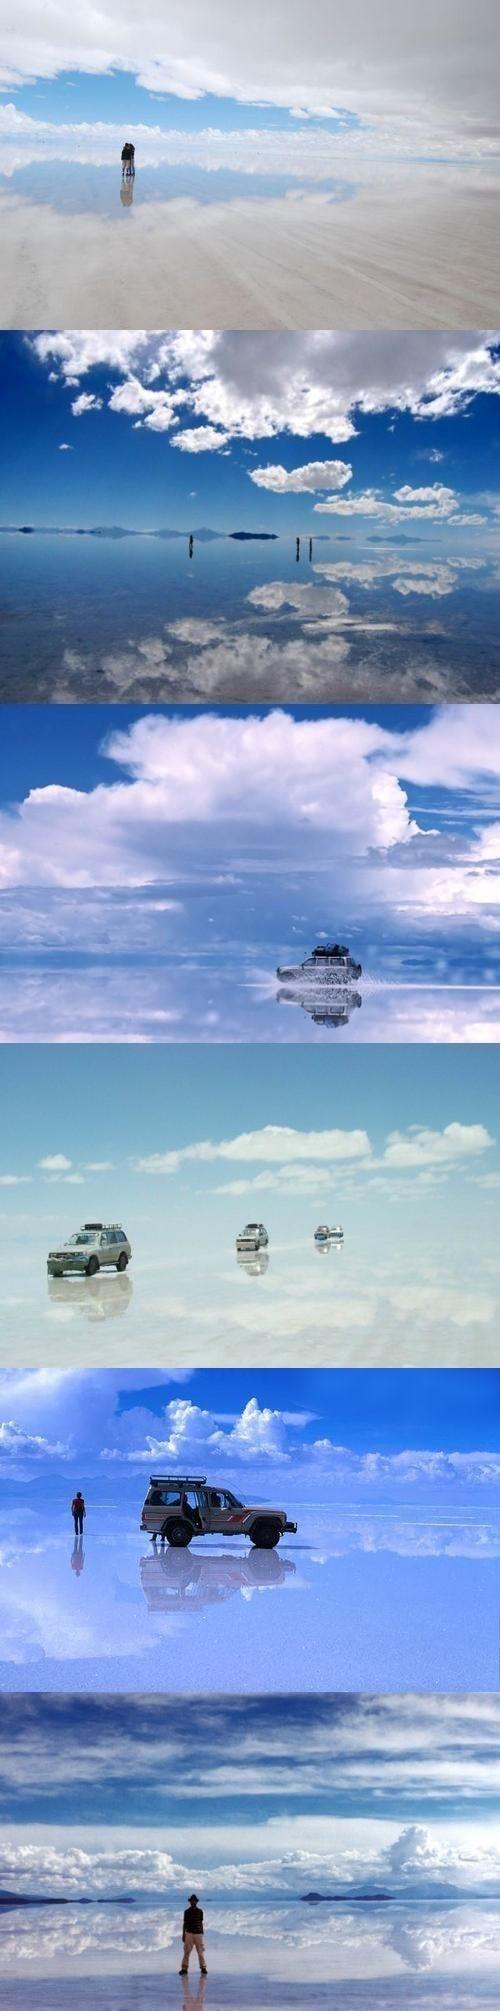 It's called the border between heaven and earth - Solar De Uyuni, Bolivia